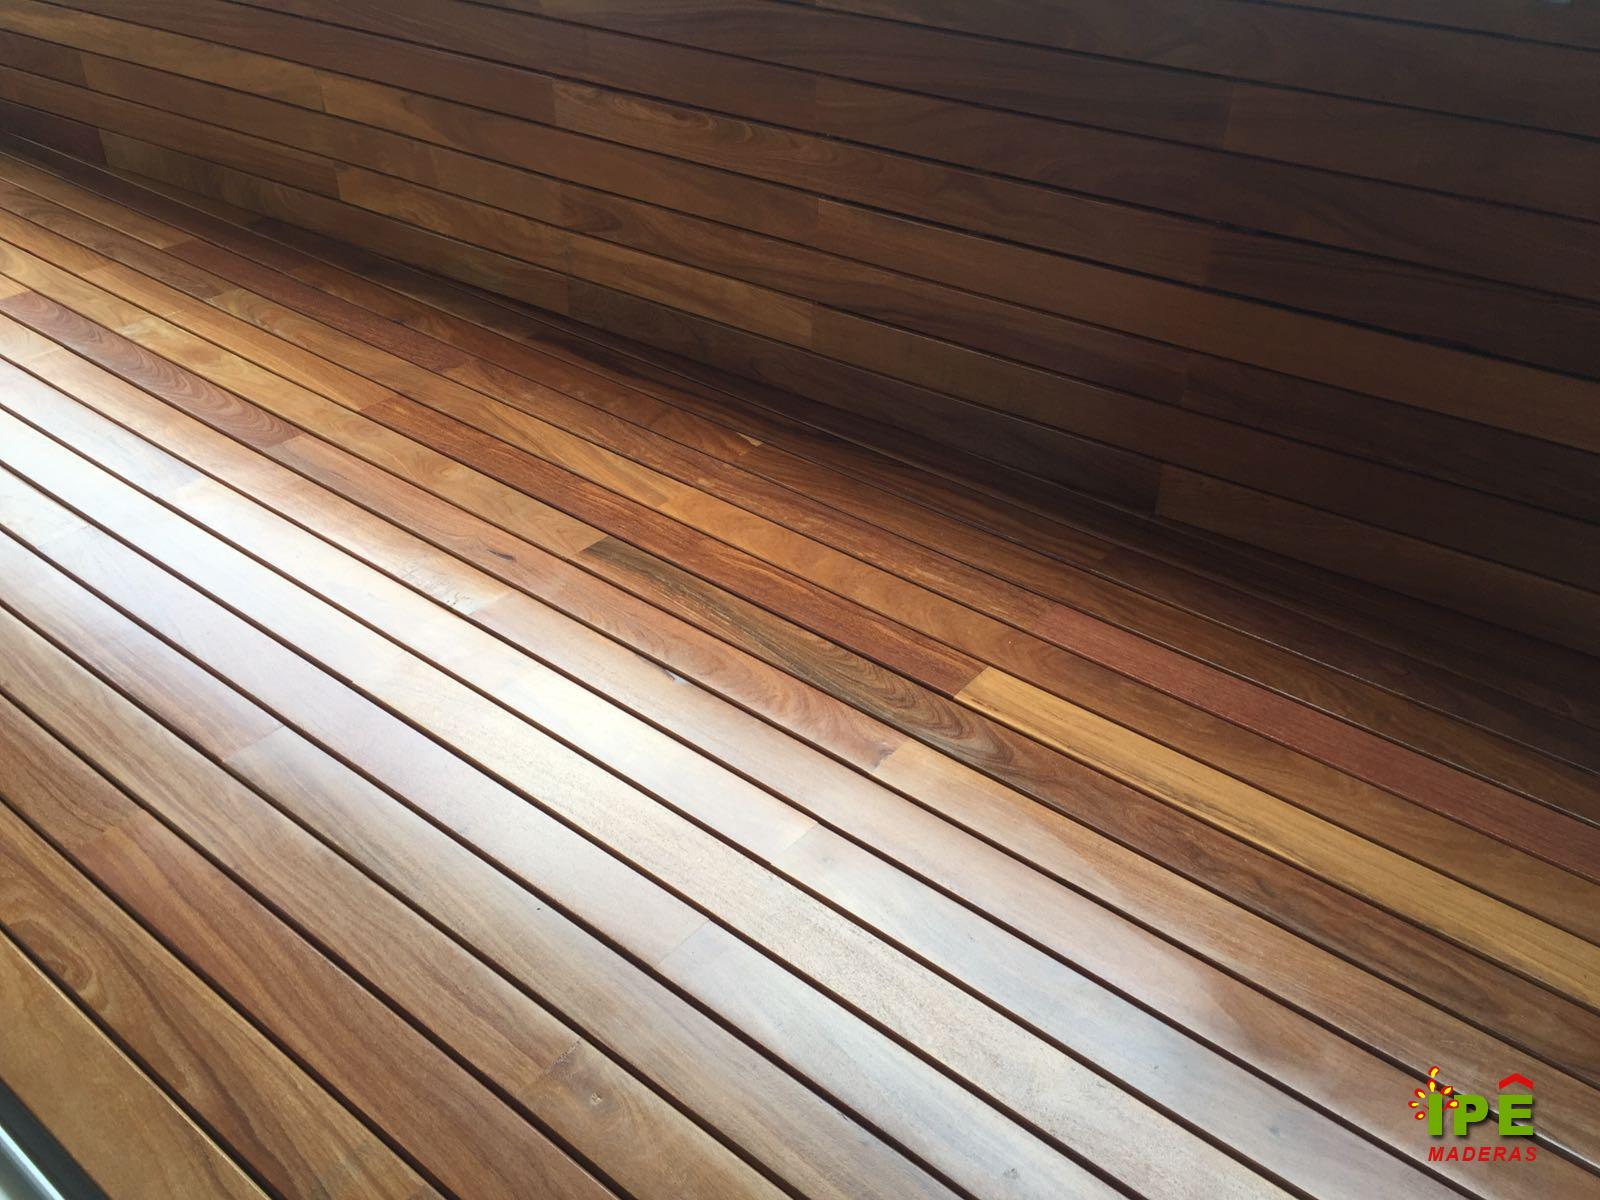 Tarima de madera en exterior ático Barcelona